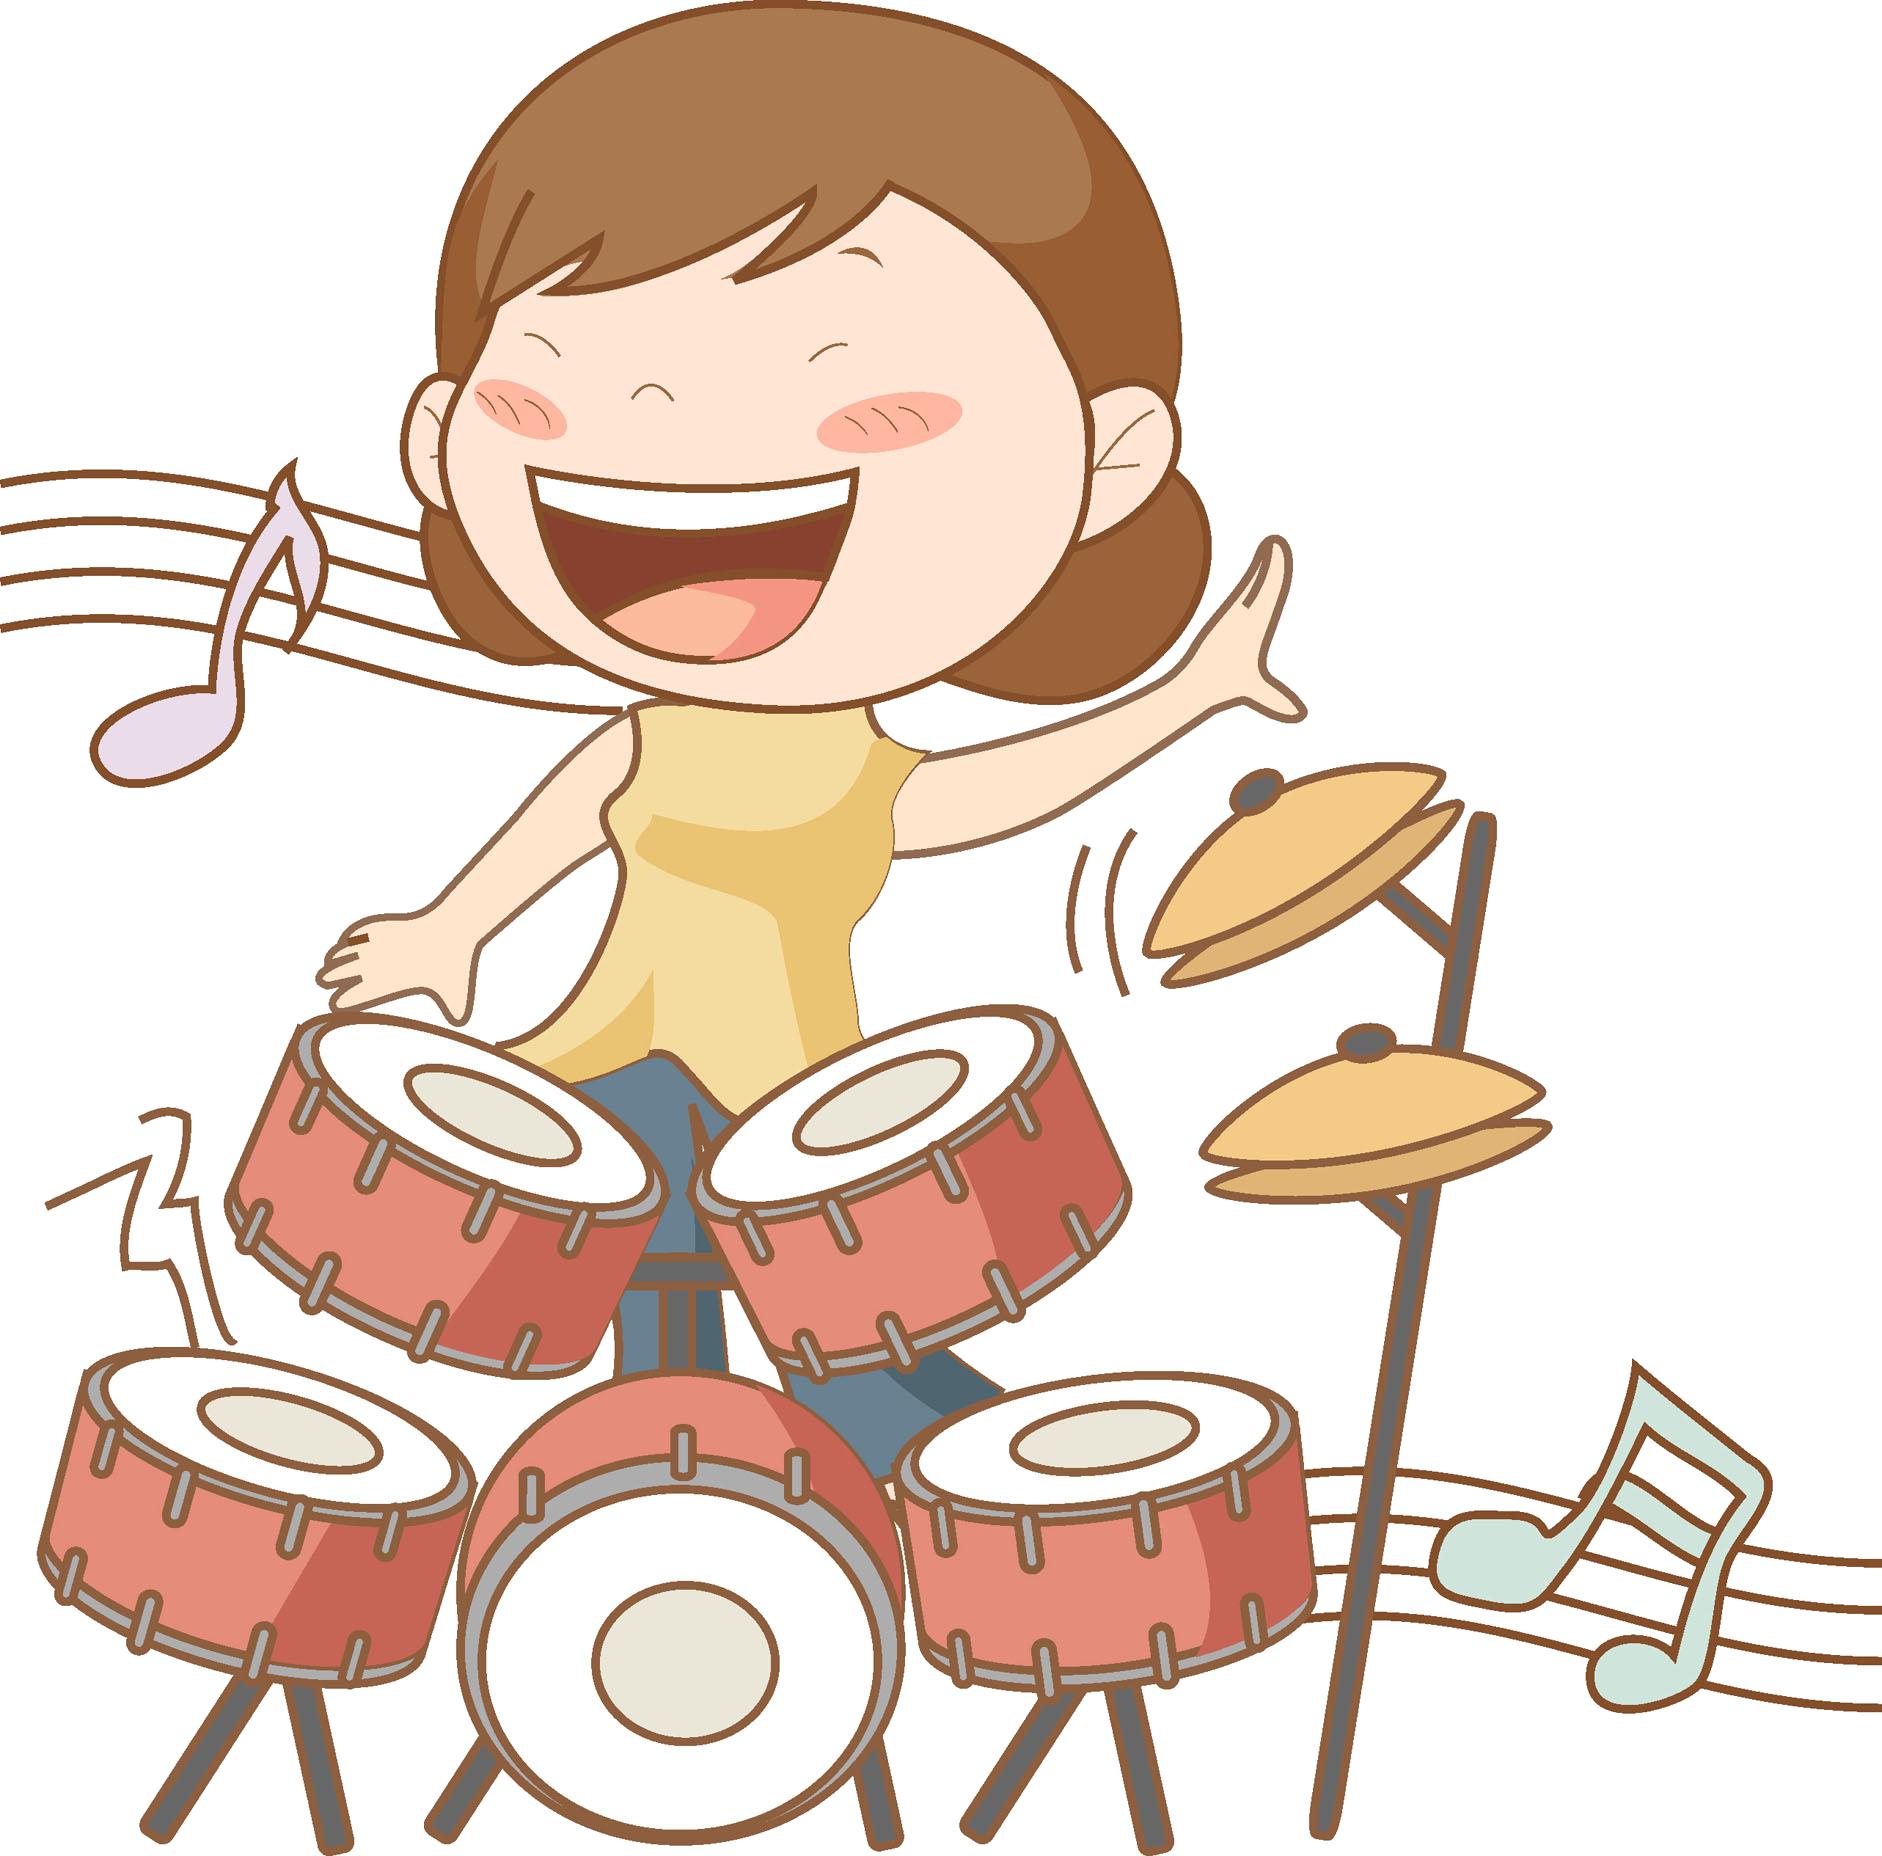 Drums singer clip art. Clipart hand drumming